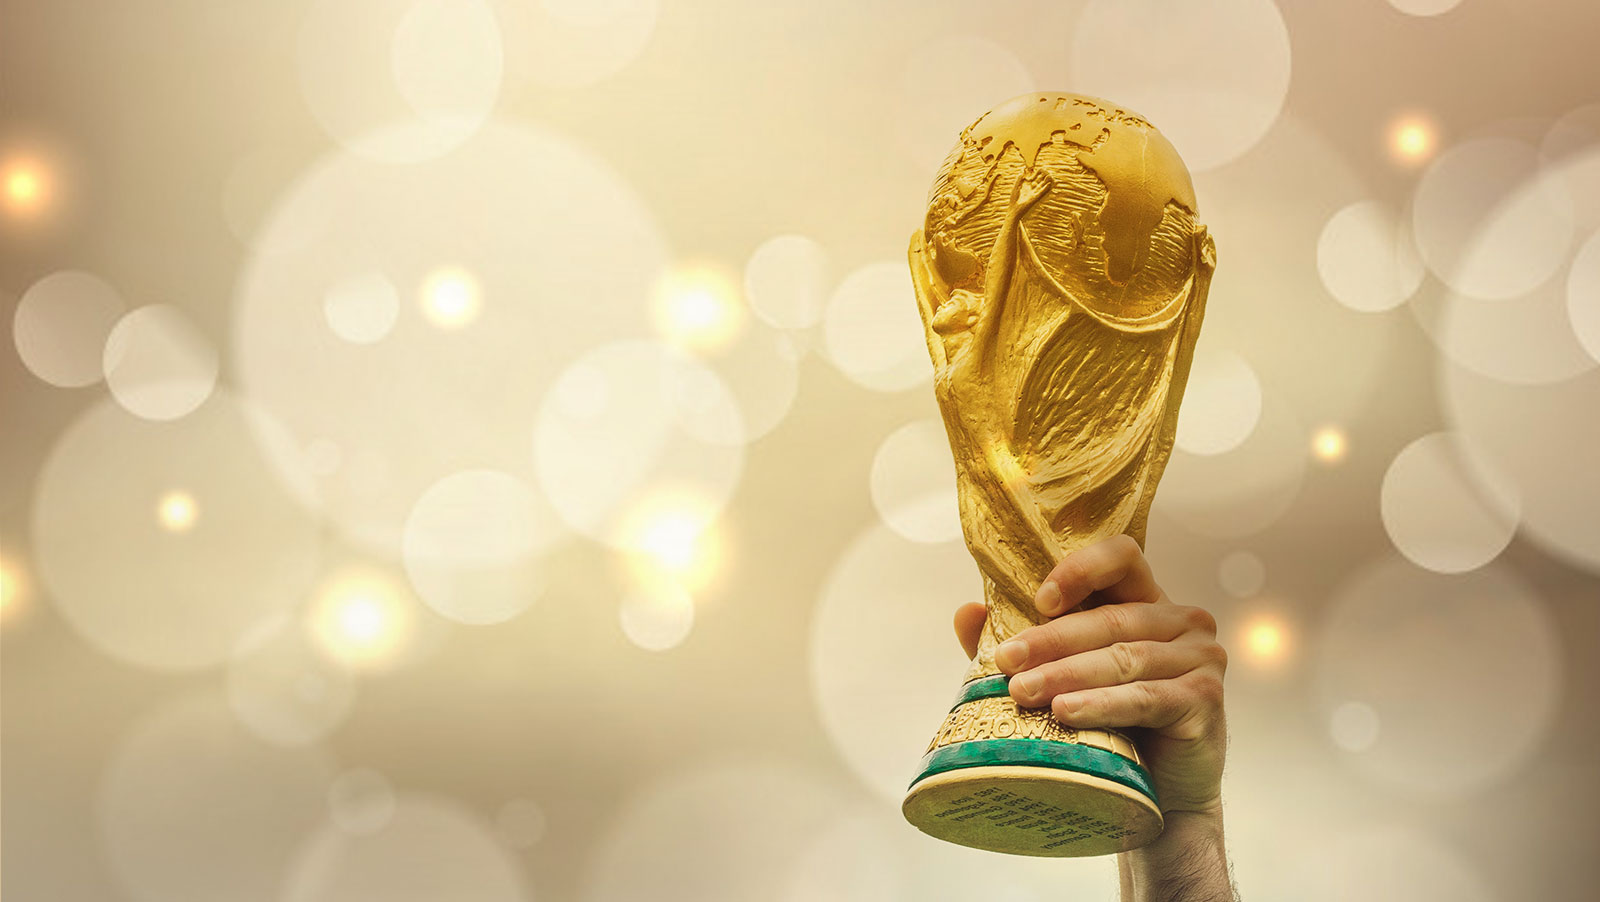 Messi and Klopp both star at FIFA Best Awards